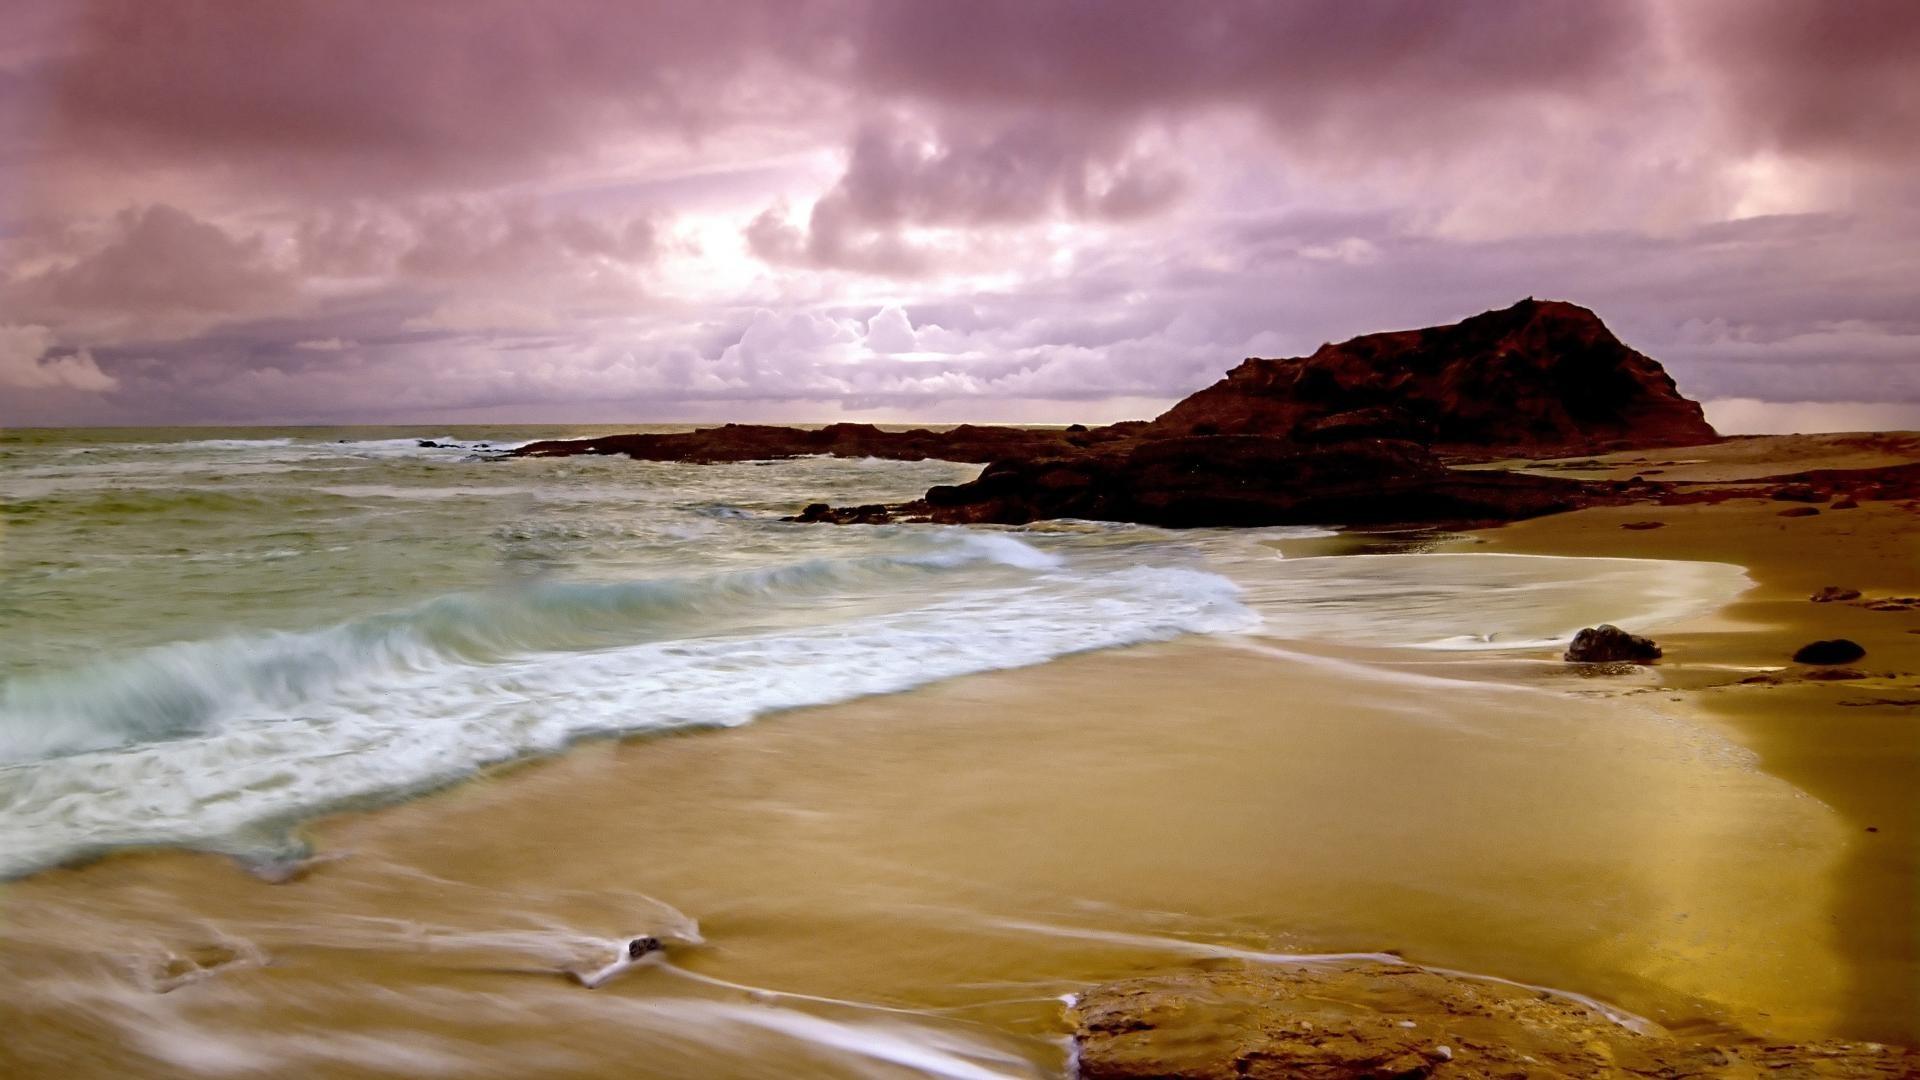 Ocean Tag – Ocean Beach Landscape Nature Scenes Wallpaper Desktop for HD  16:9 High